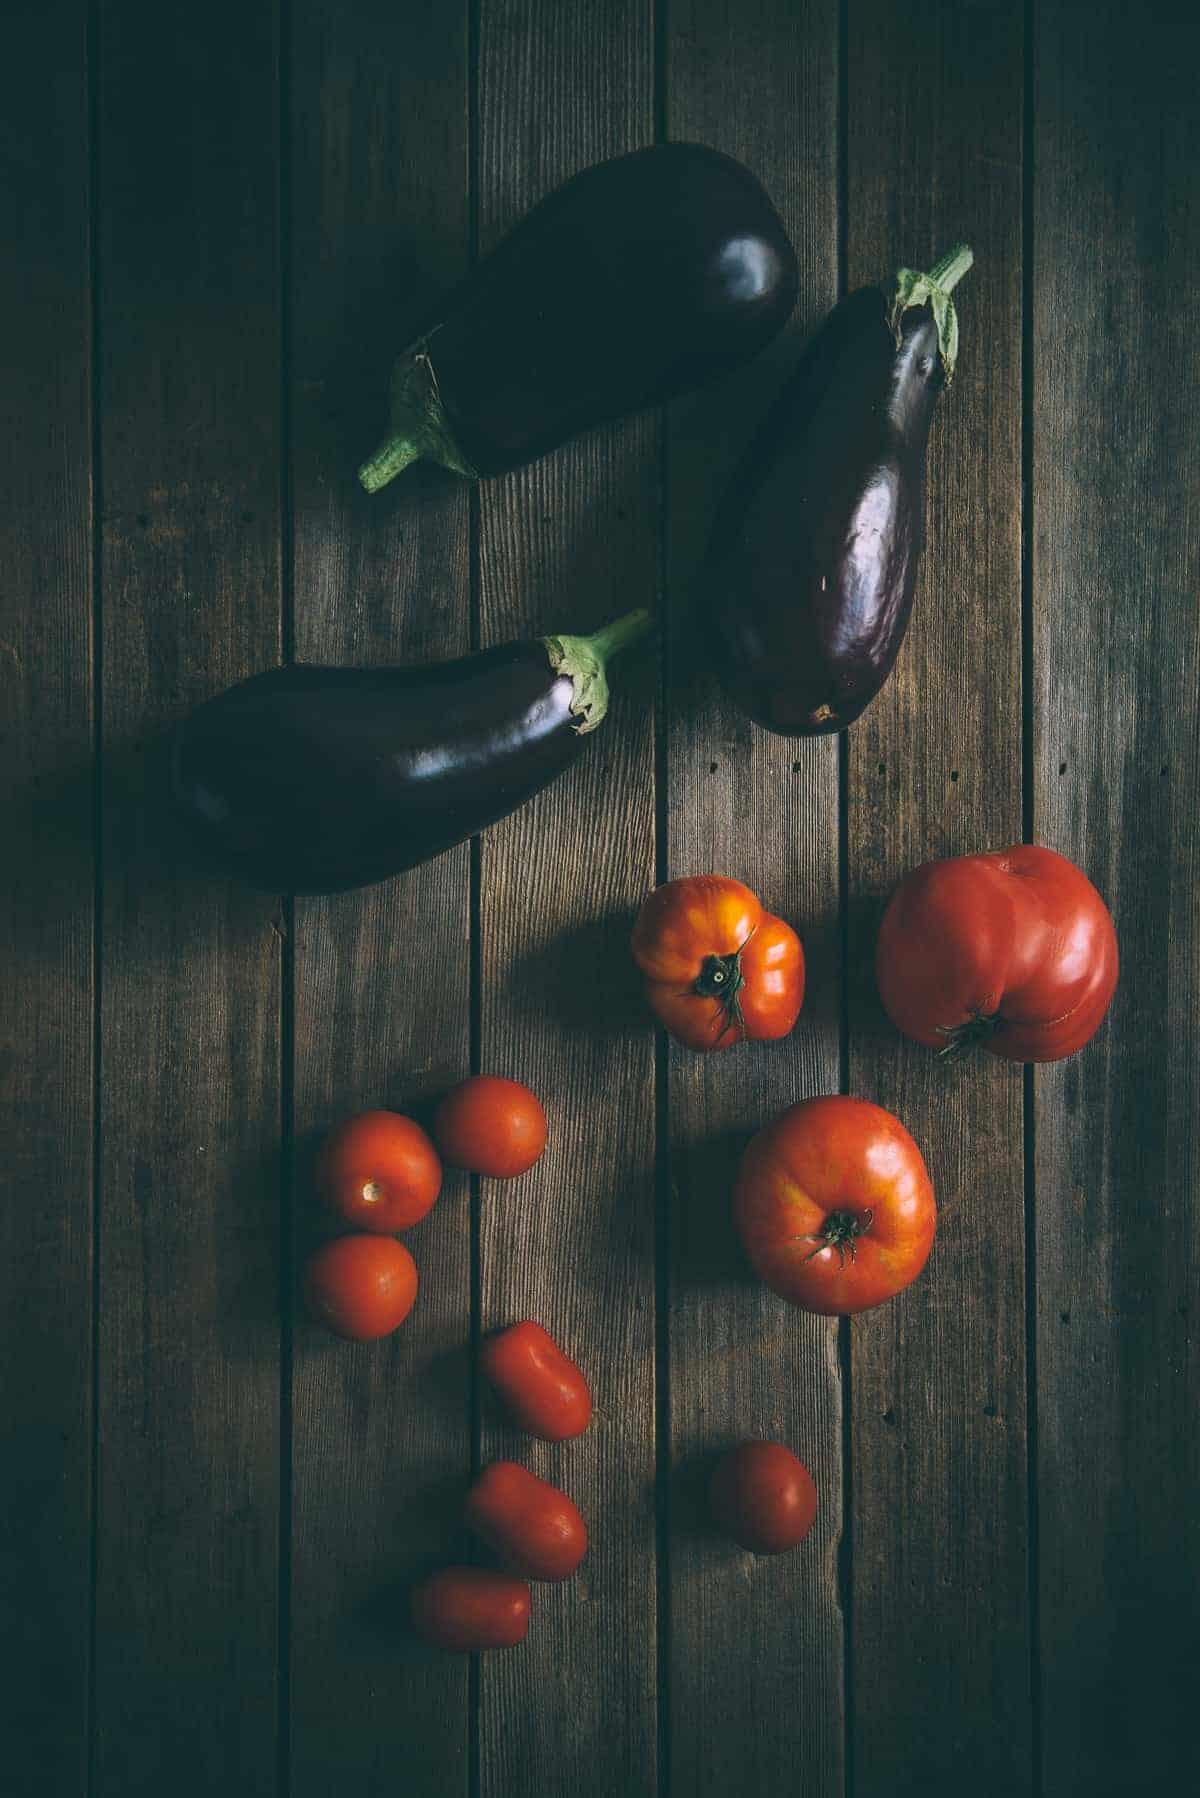 eggplants and tomatoes